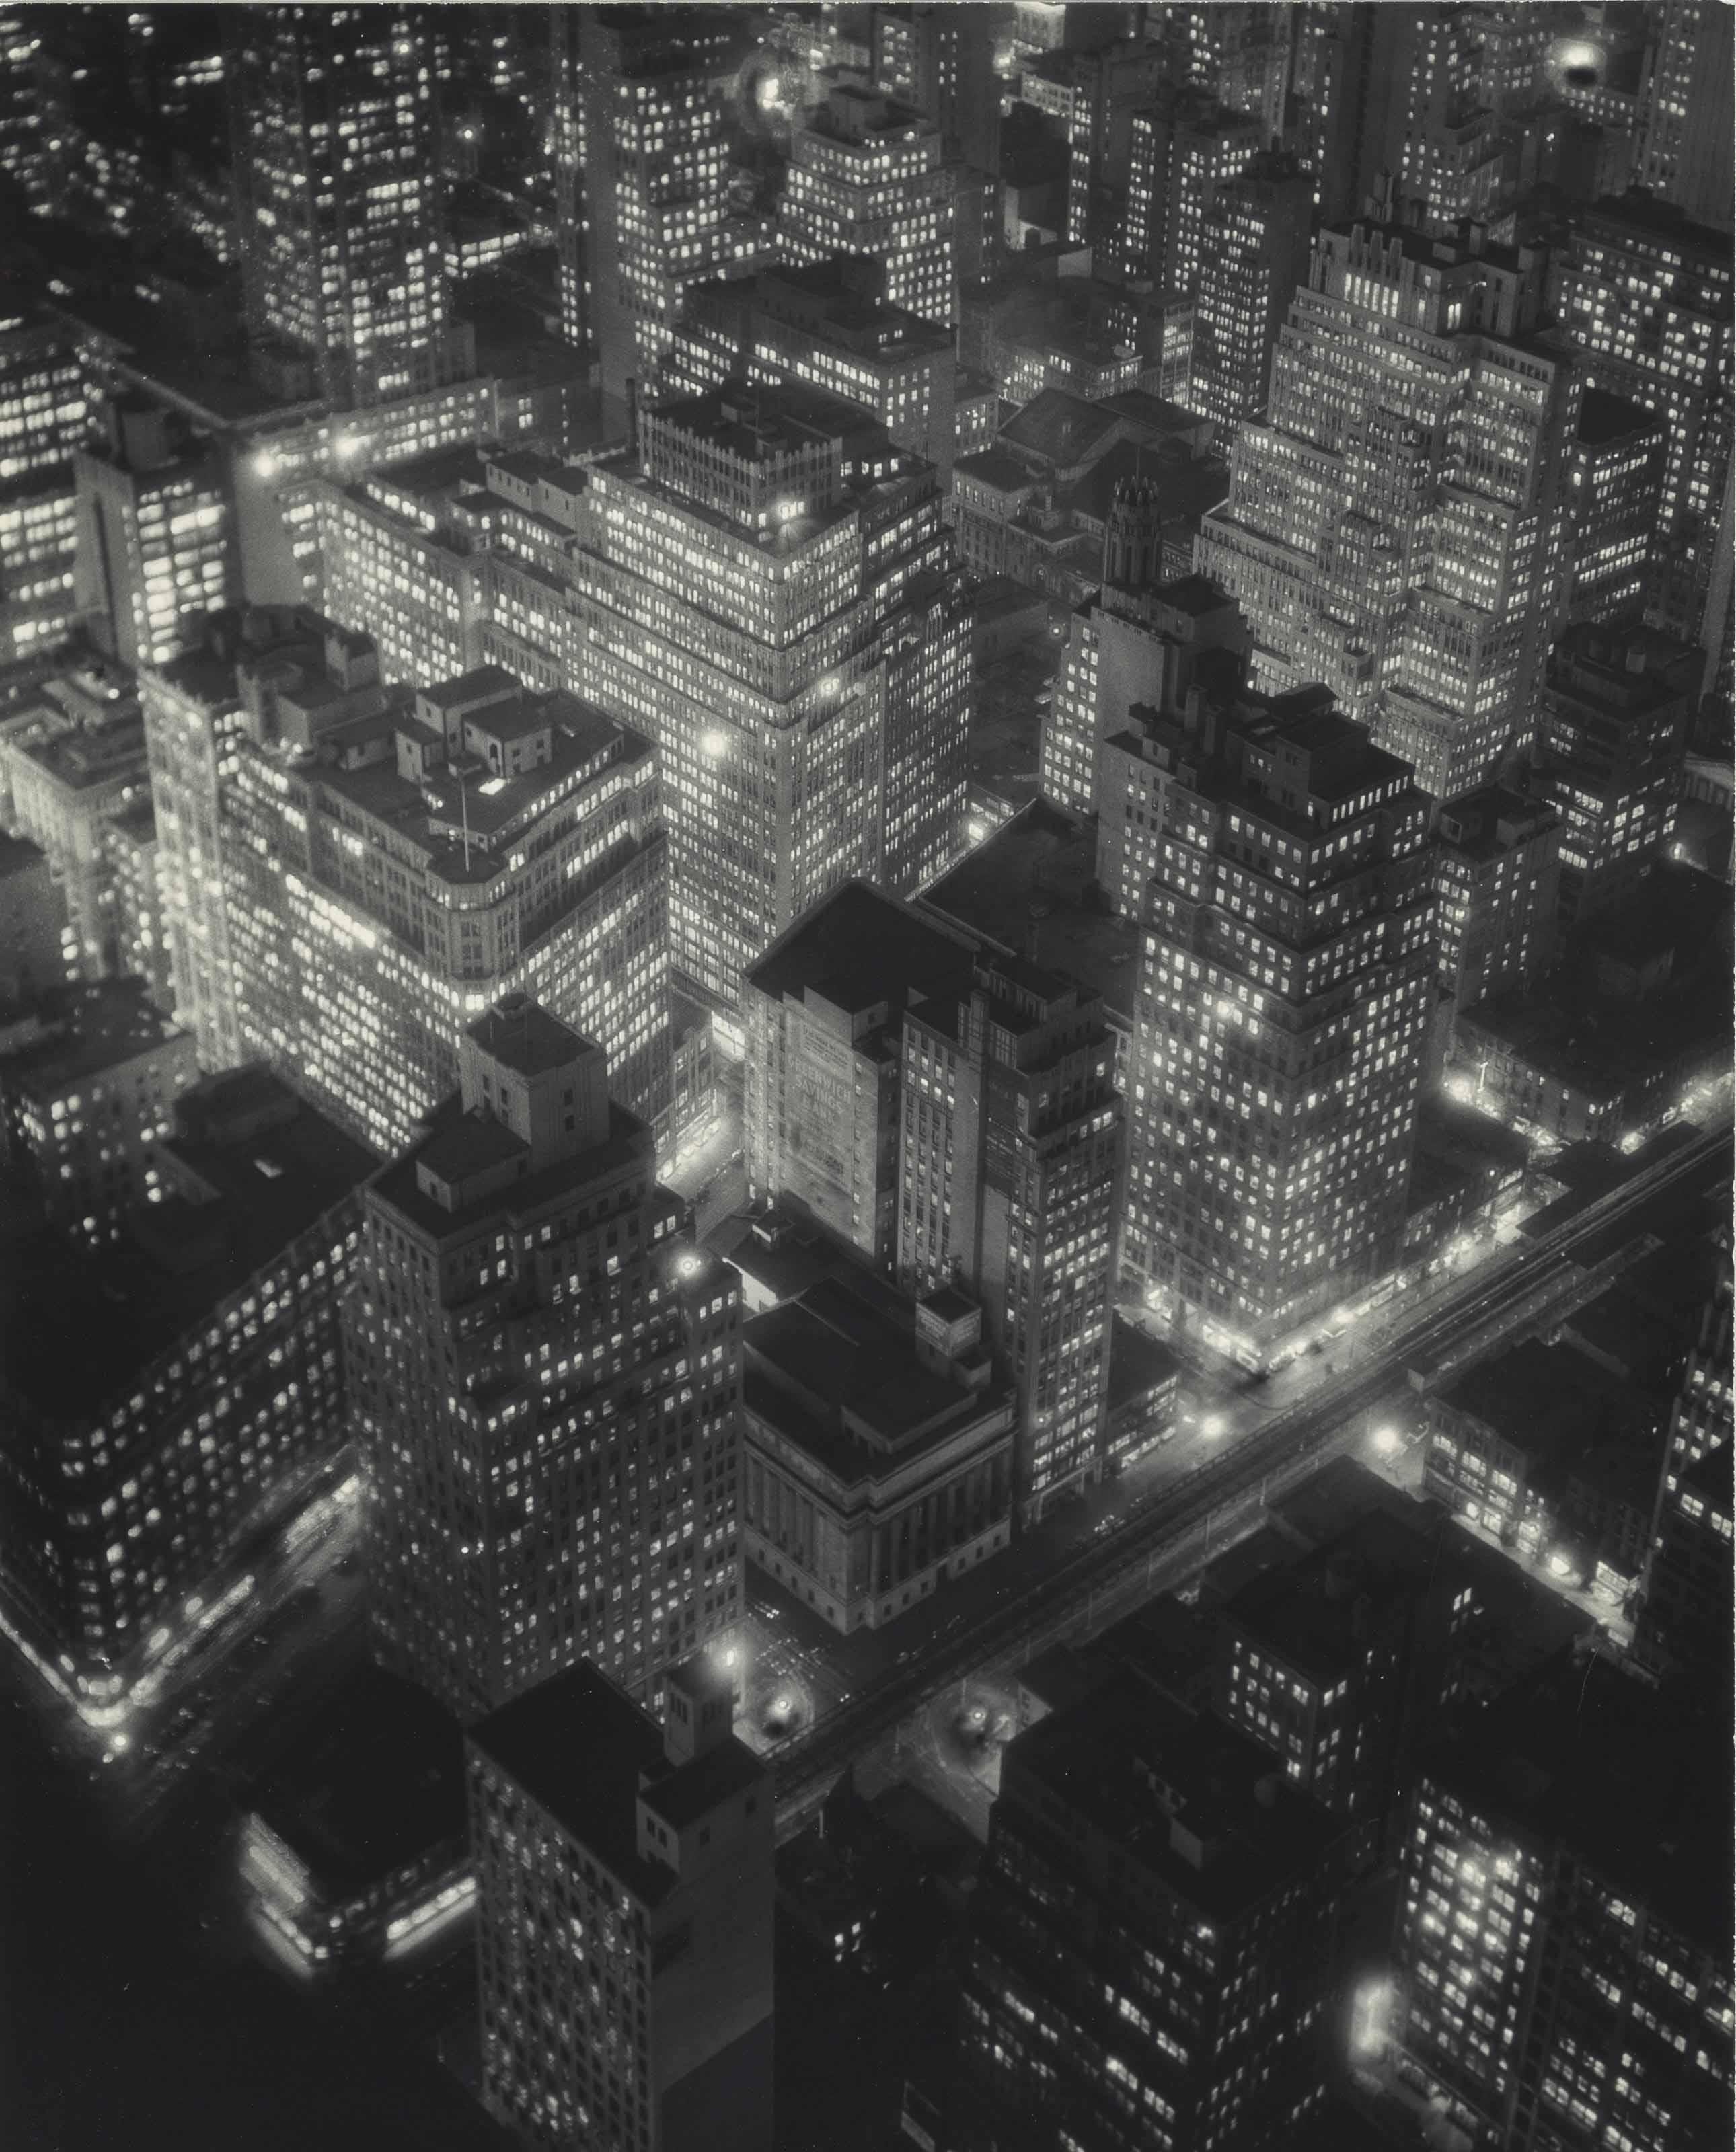 New York at Night, 1932